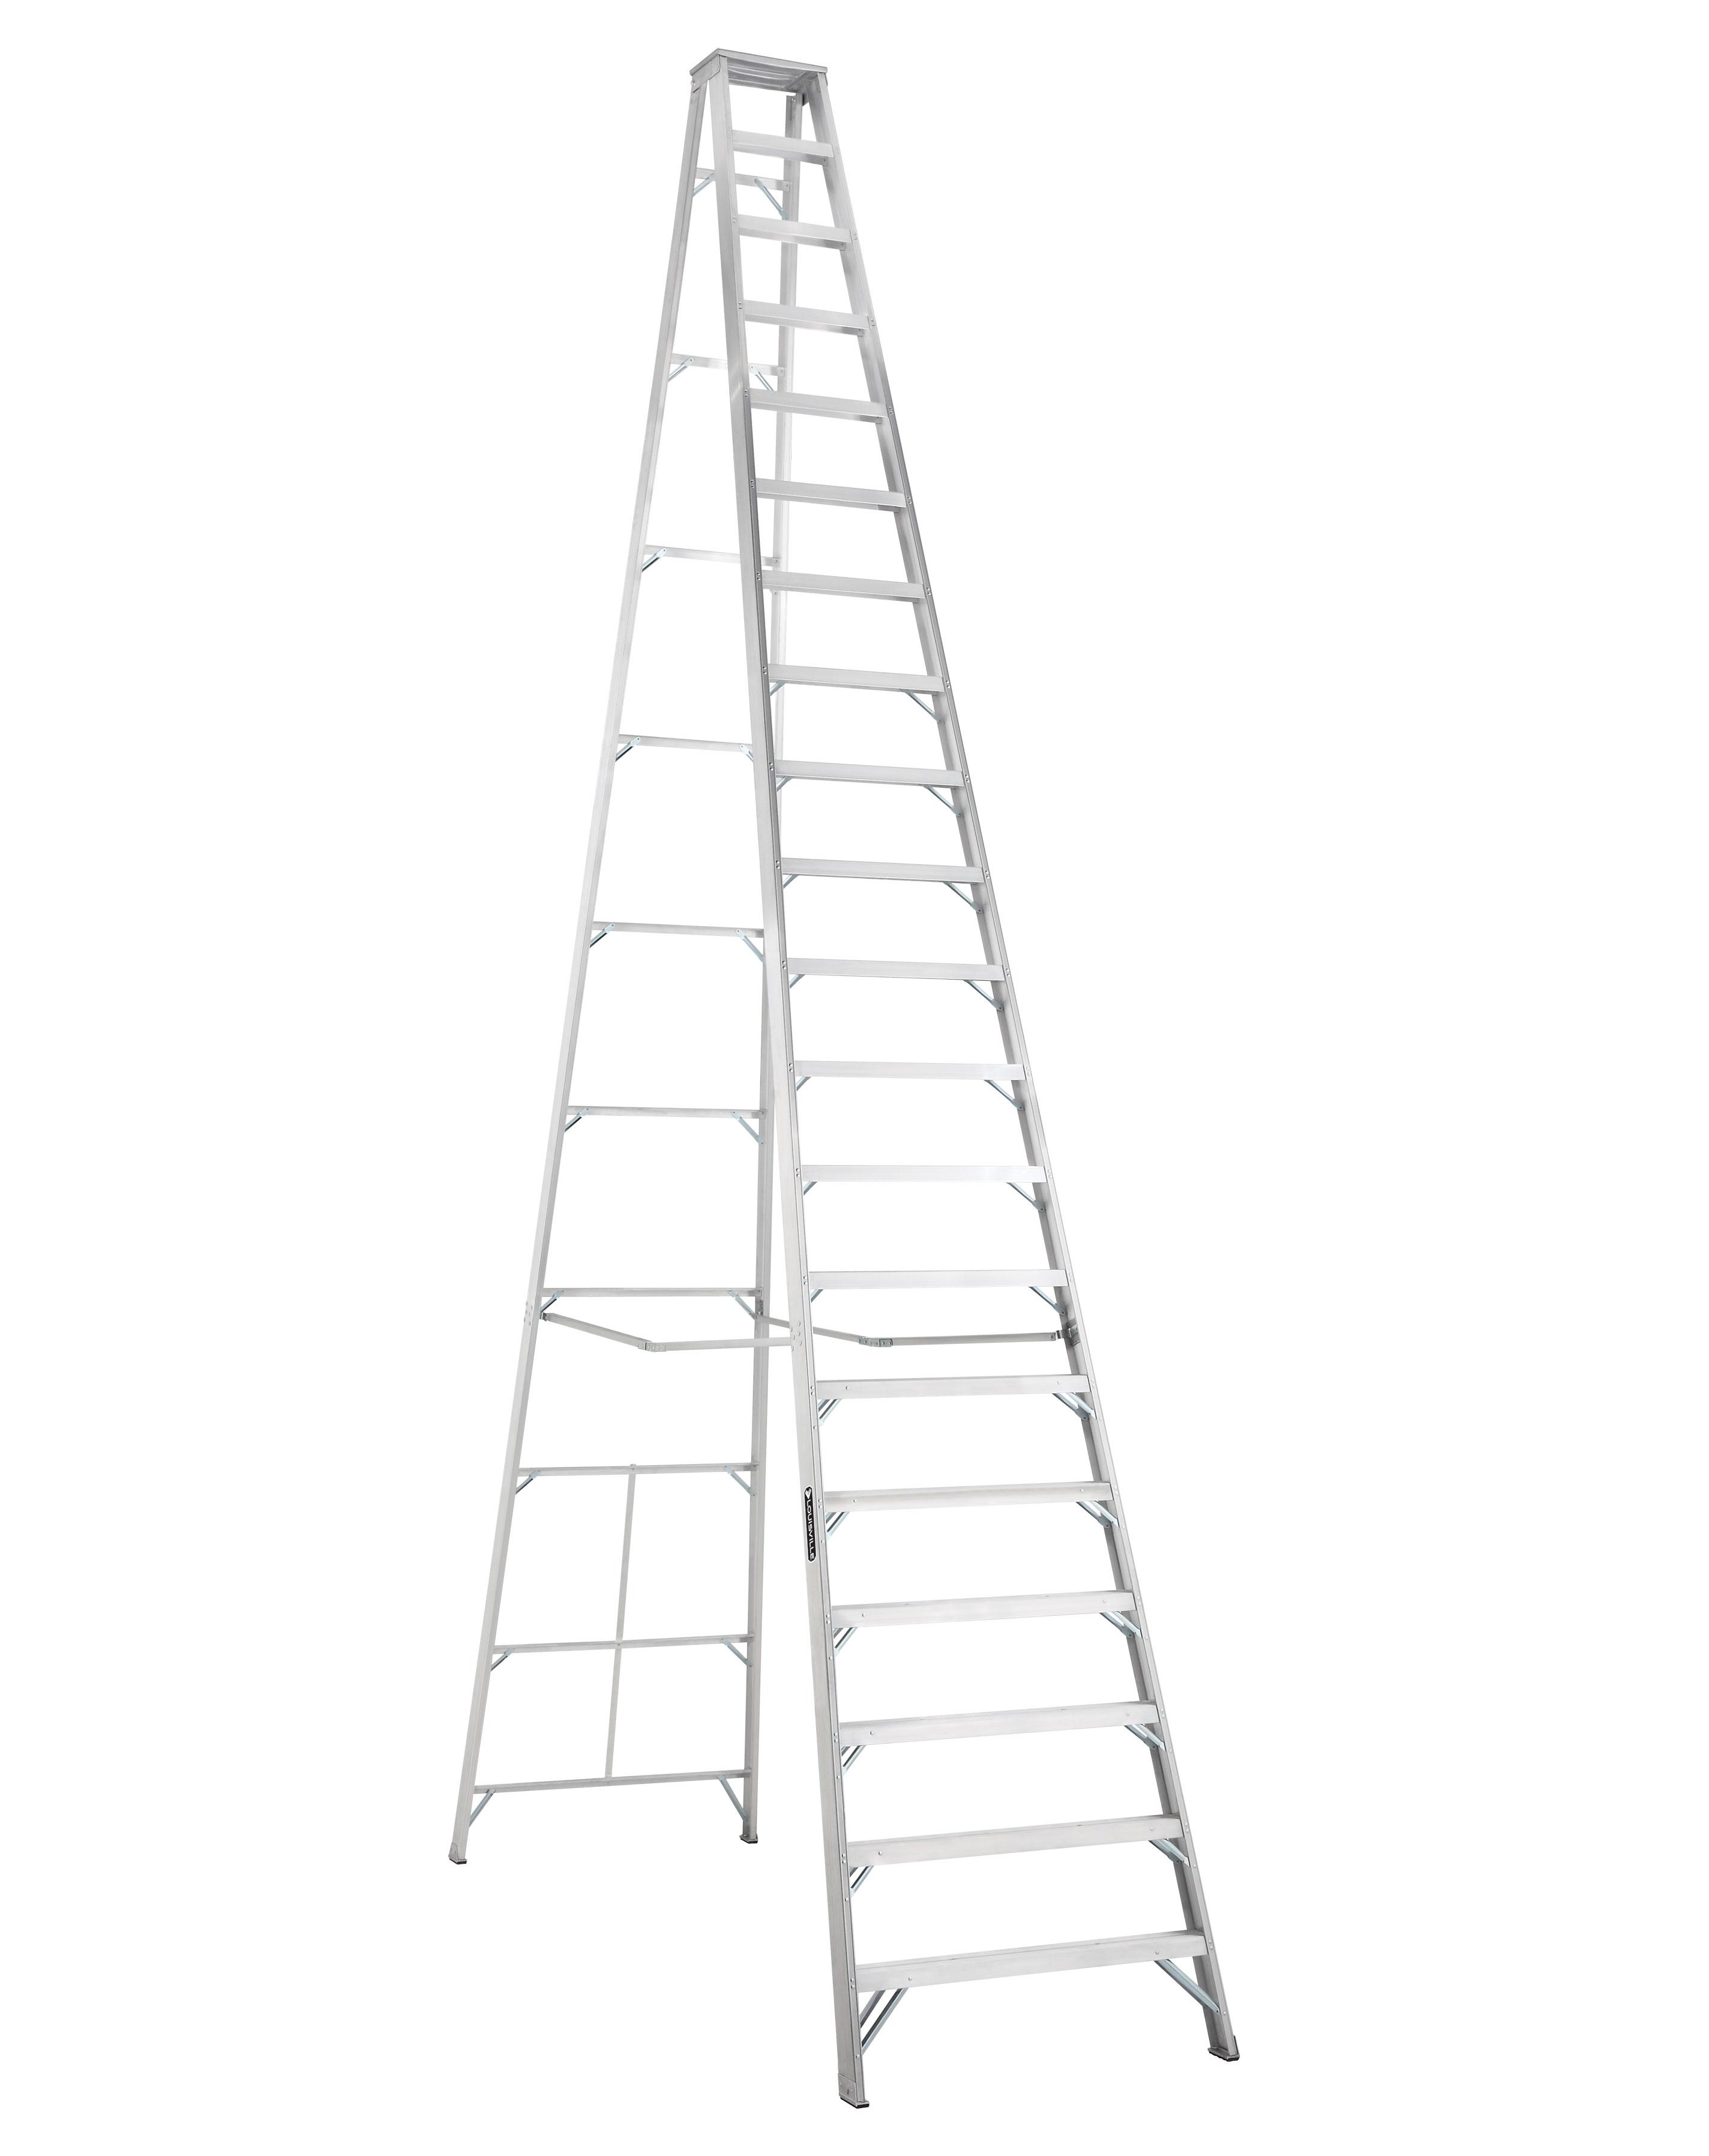 Louisville Ladder AS1020 20 Foot 300 lb Duty Rating Aluminum Stepladder